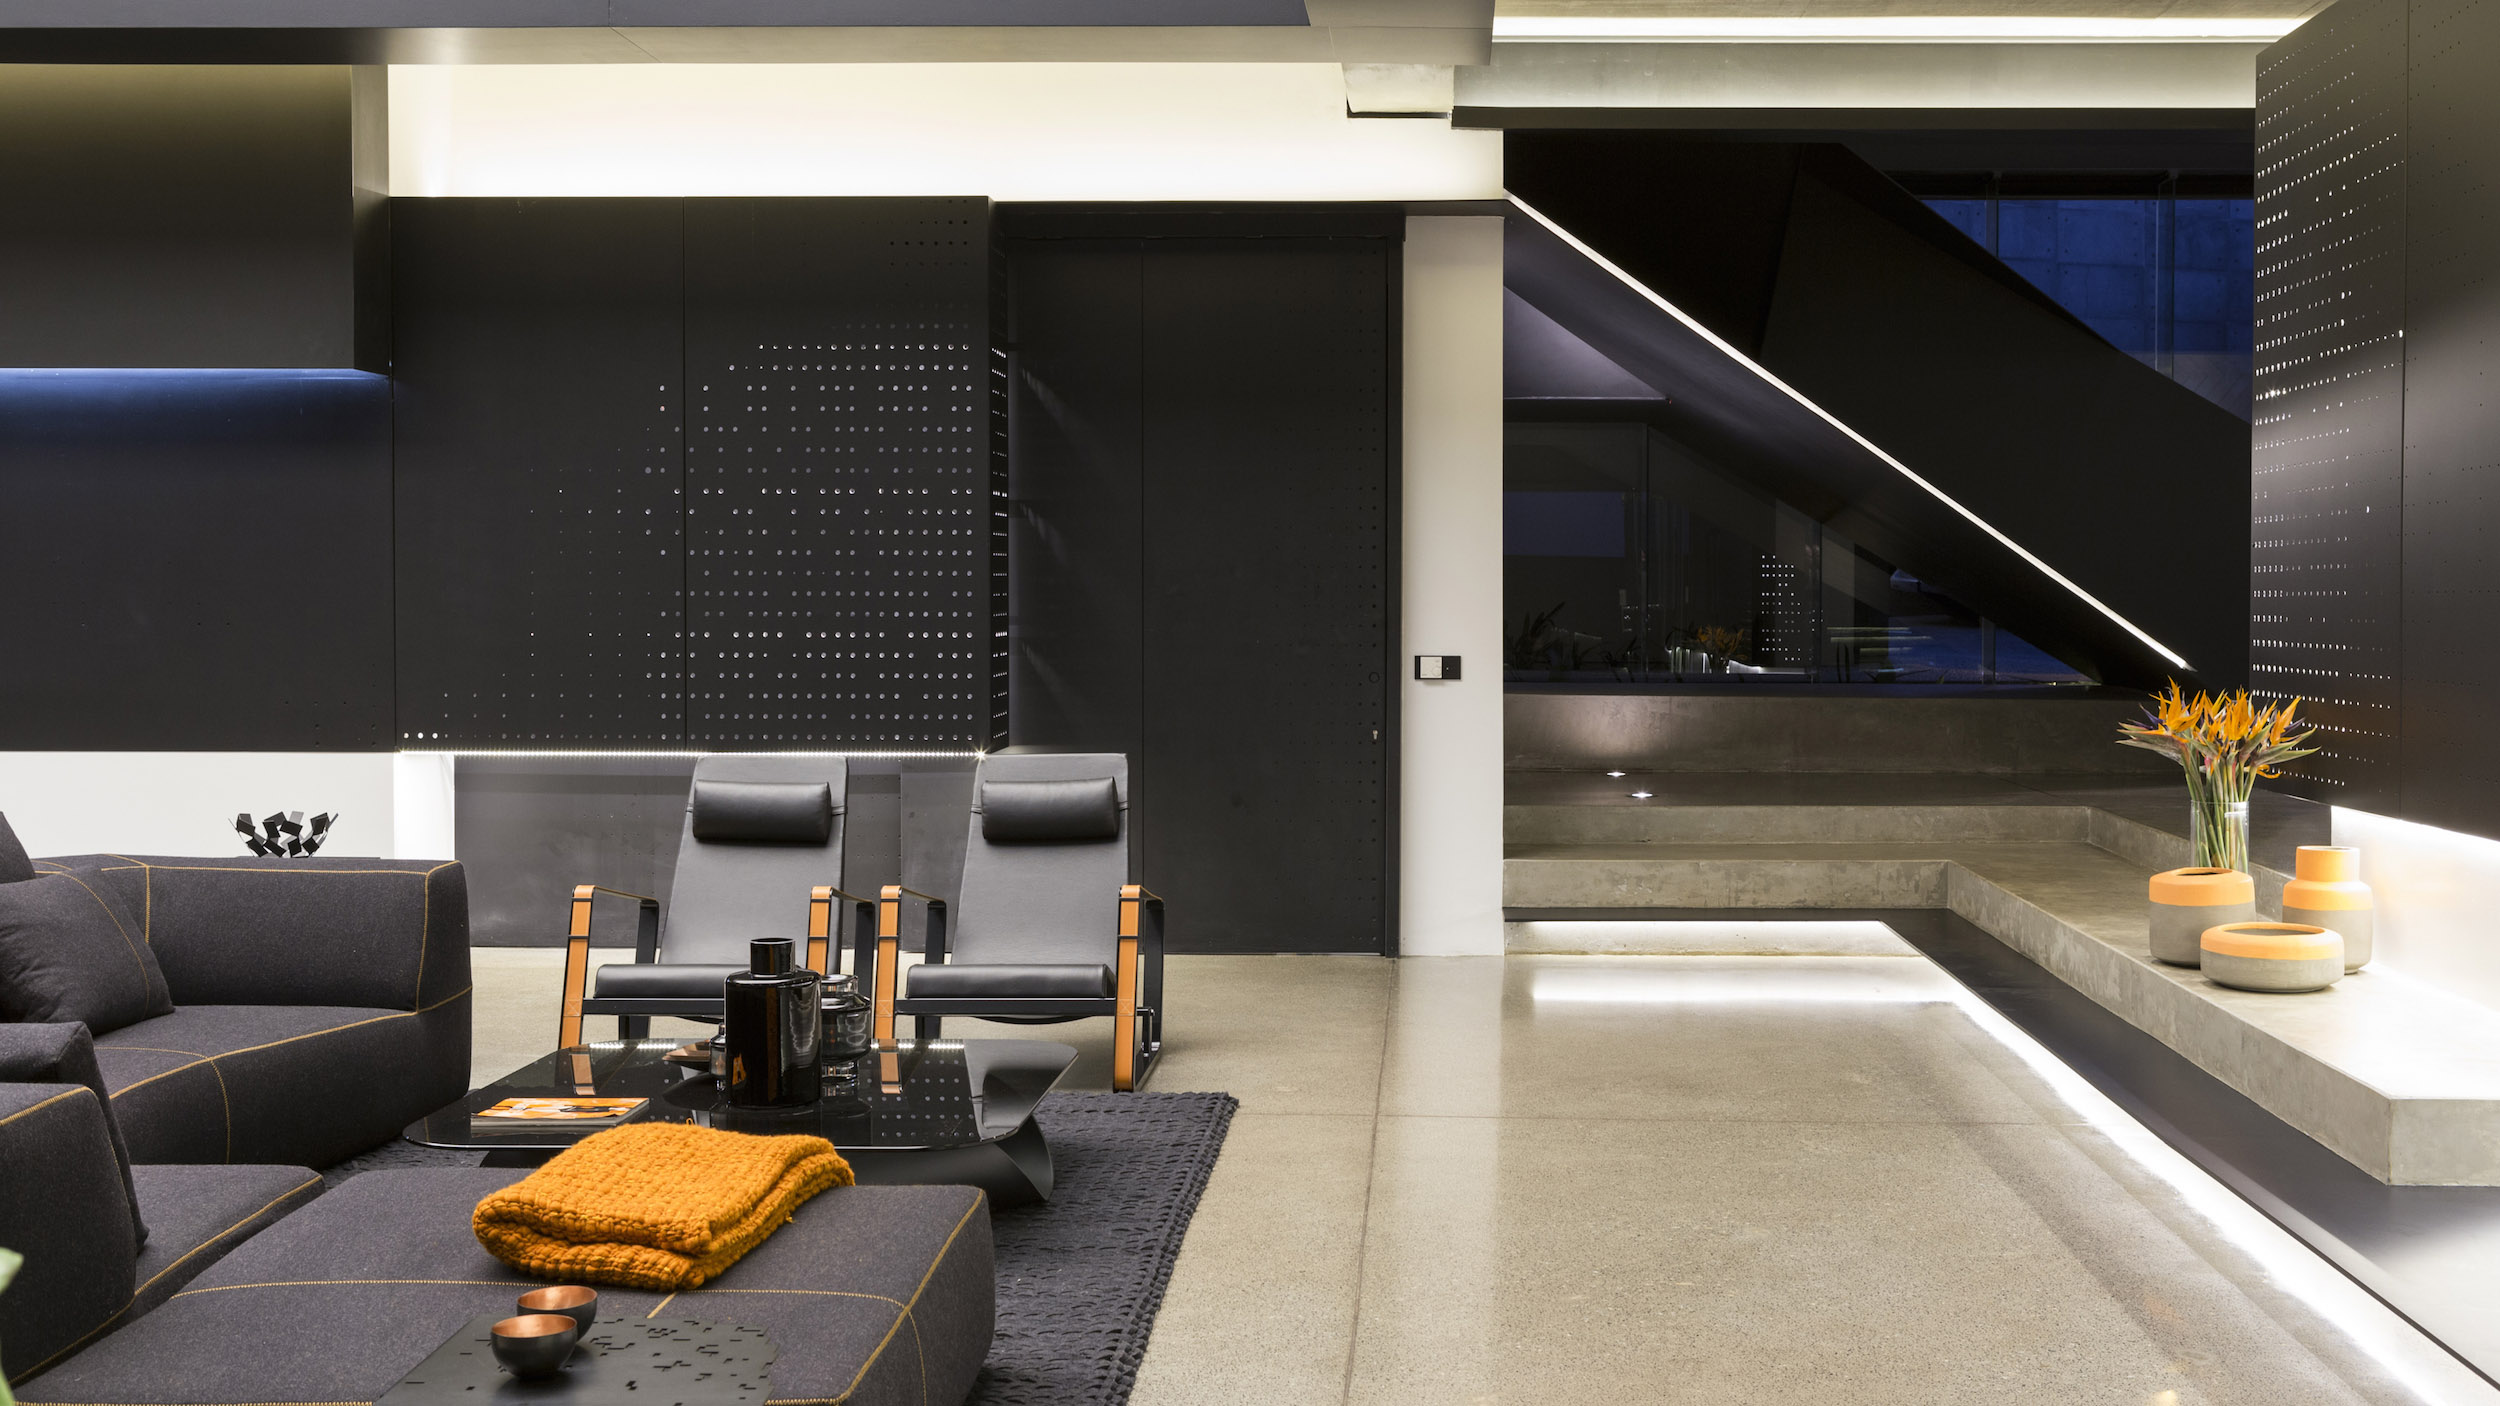 Kloof Road Masterpiece House in Johannesburg by Nico van der Meulen Architects-19